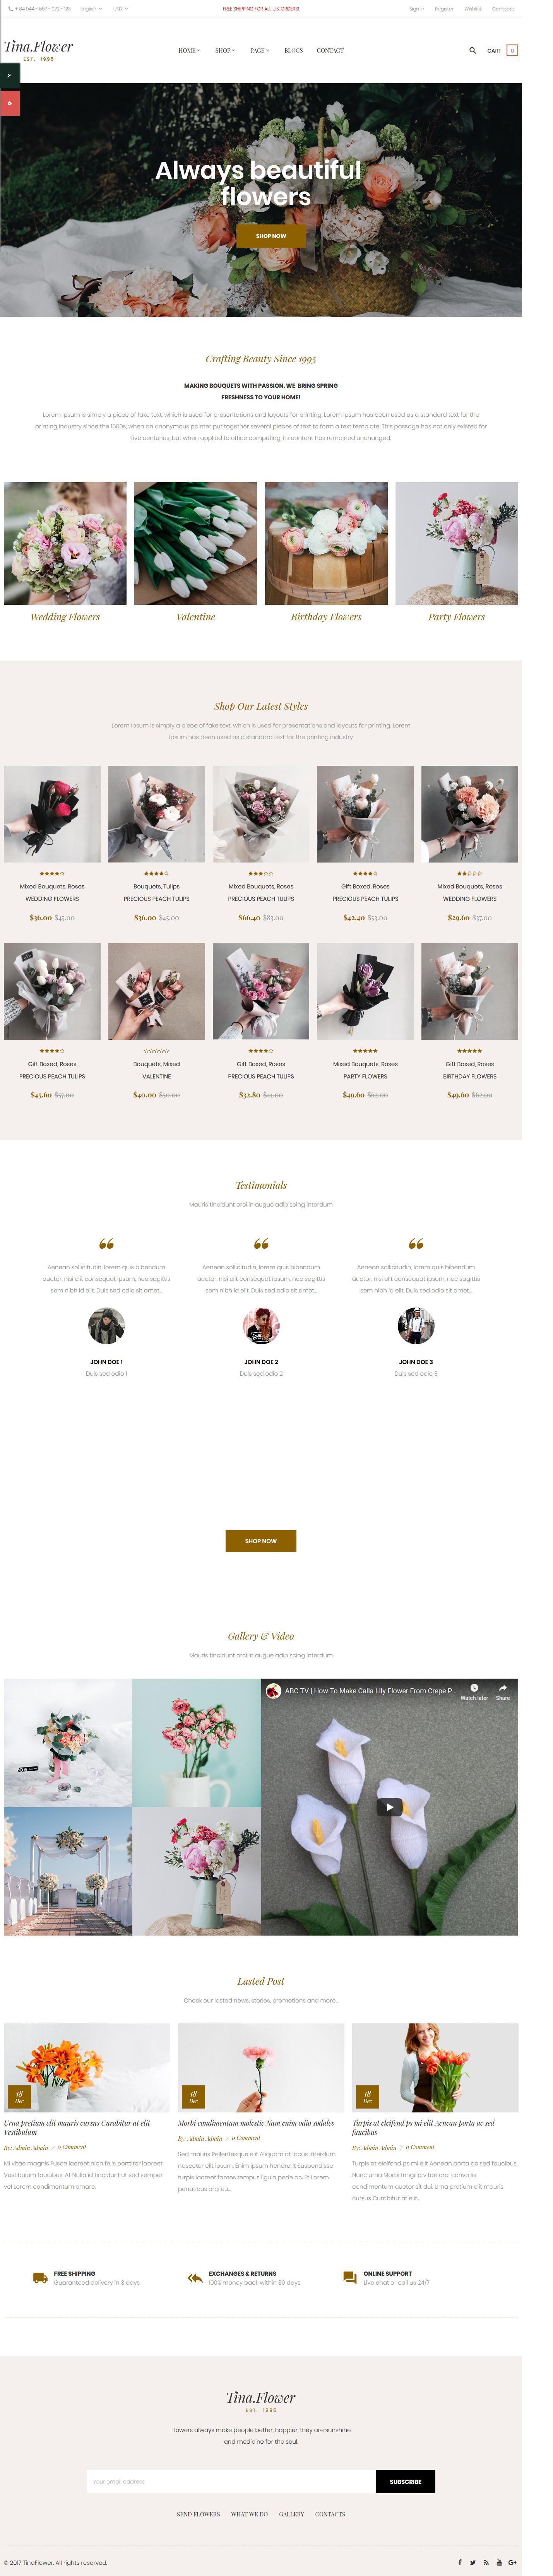 Pts Flower – Best Premium Florist and Floriculture WordPress Theme